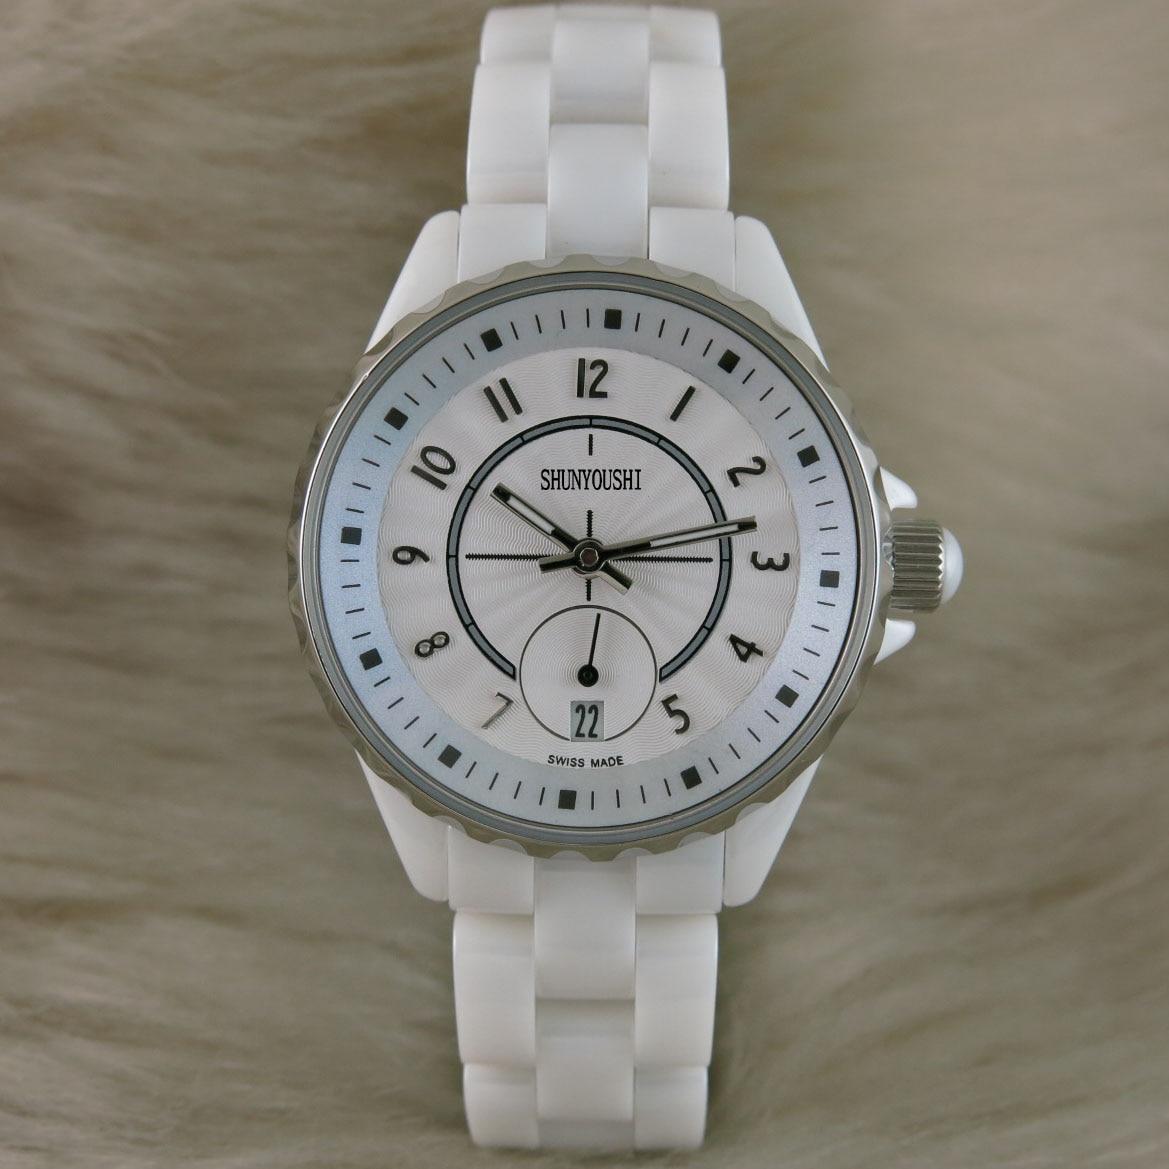 Women's Watches Top Brand Runway Luxury European Design  Quartz Wristwatches   A06507 | Fotoflaco.net